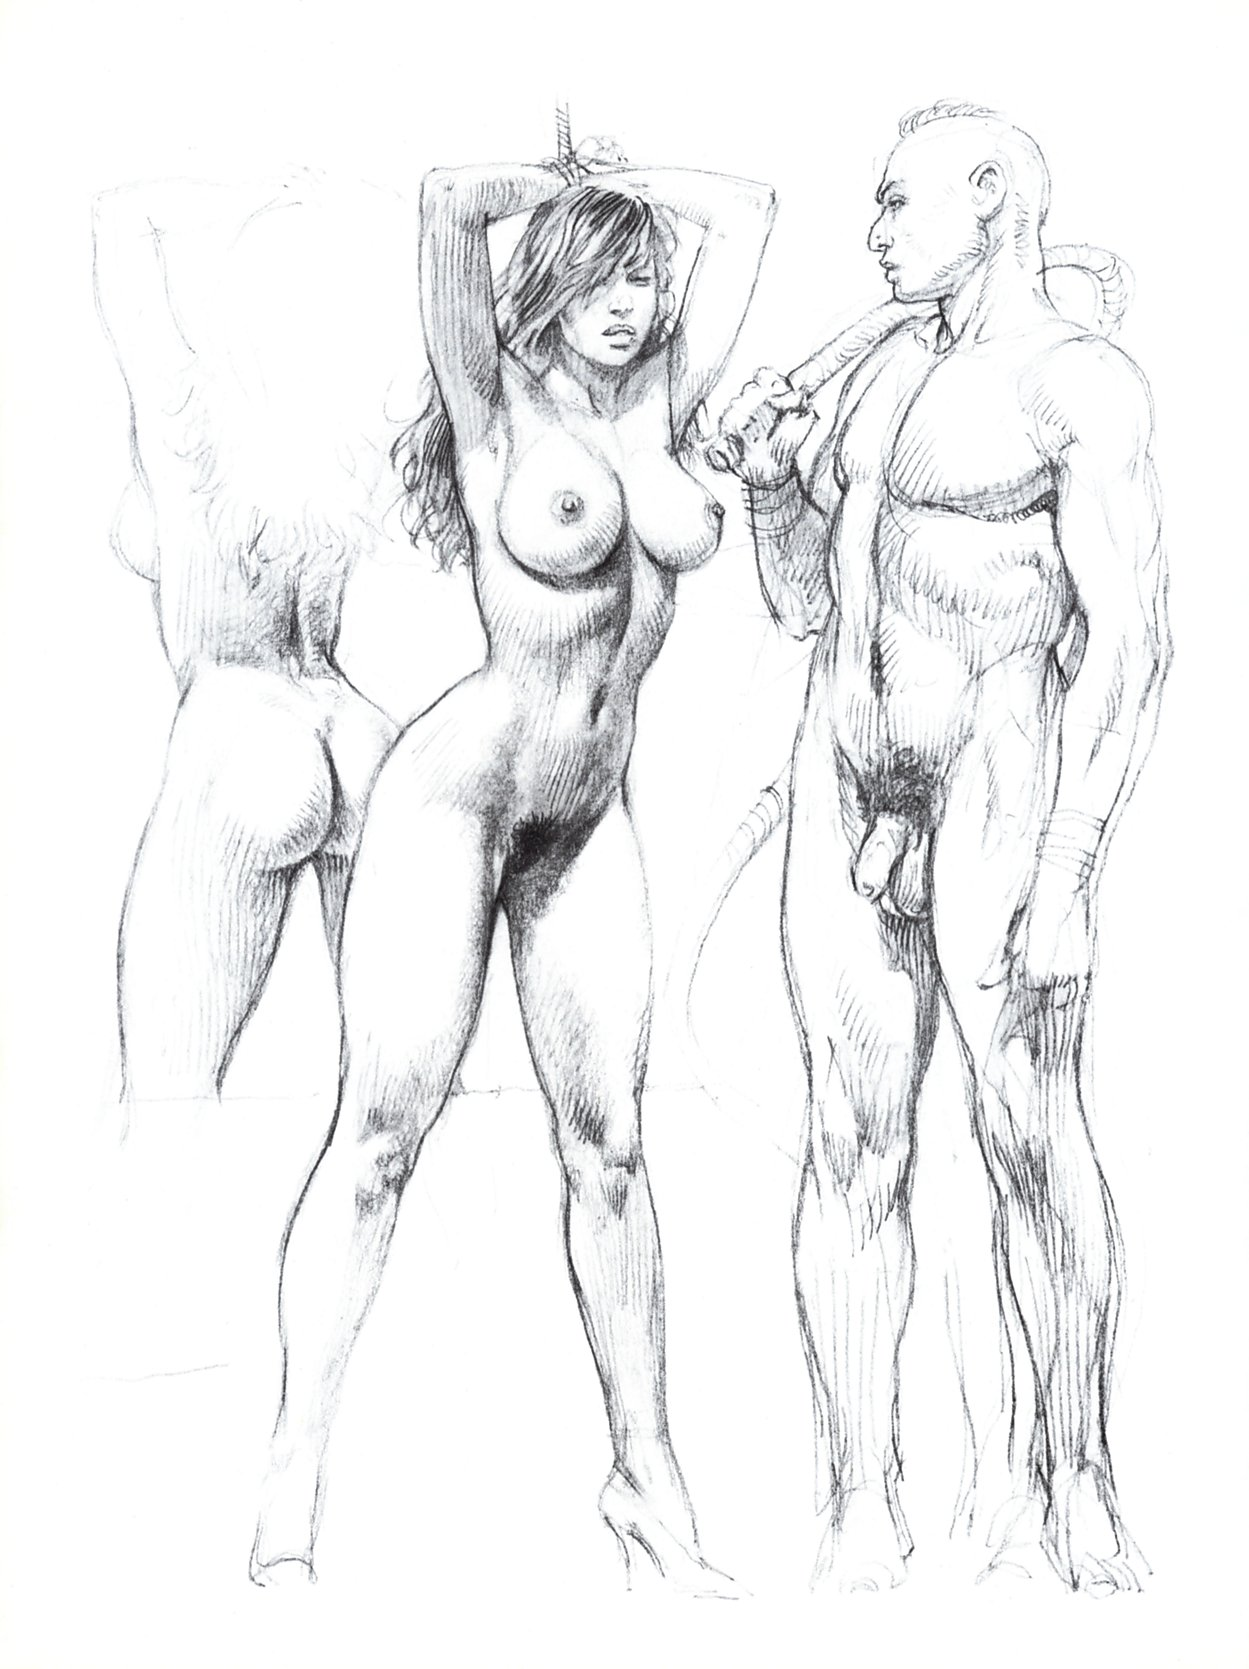 Рисунки мужчин порно 14 фотография